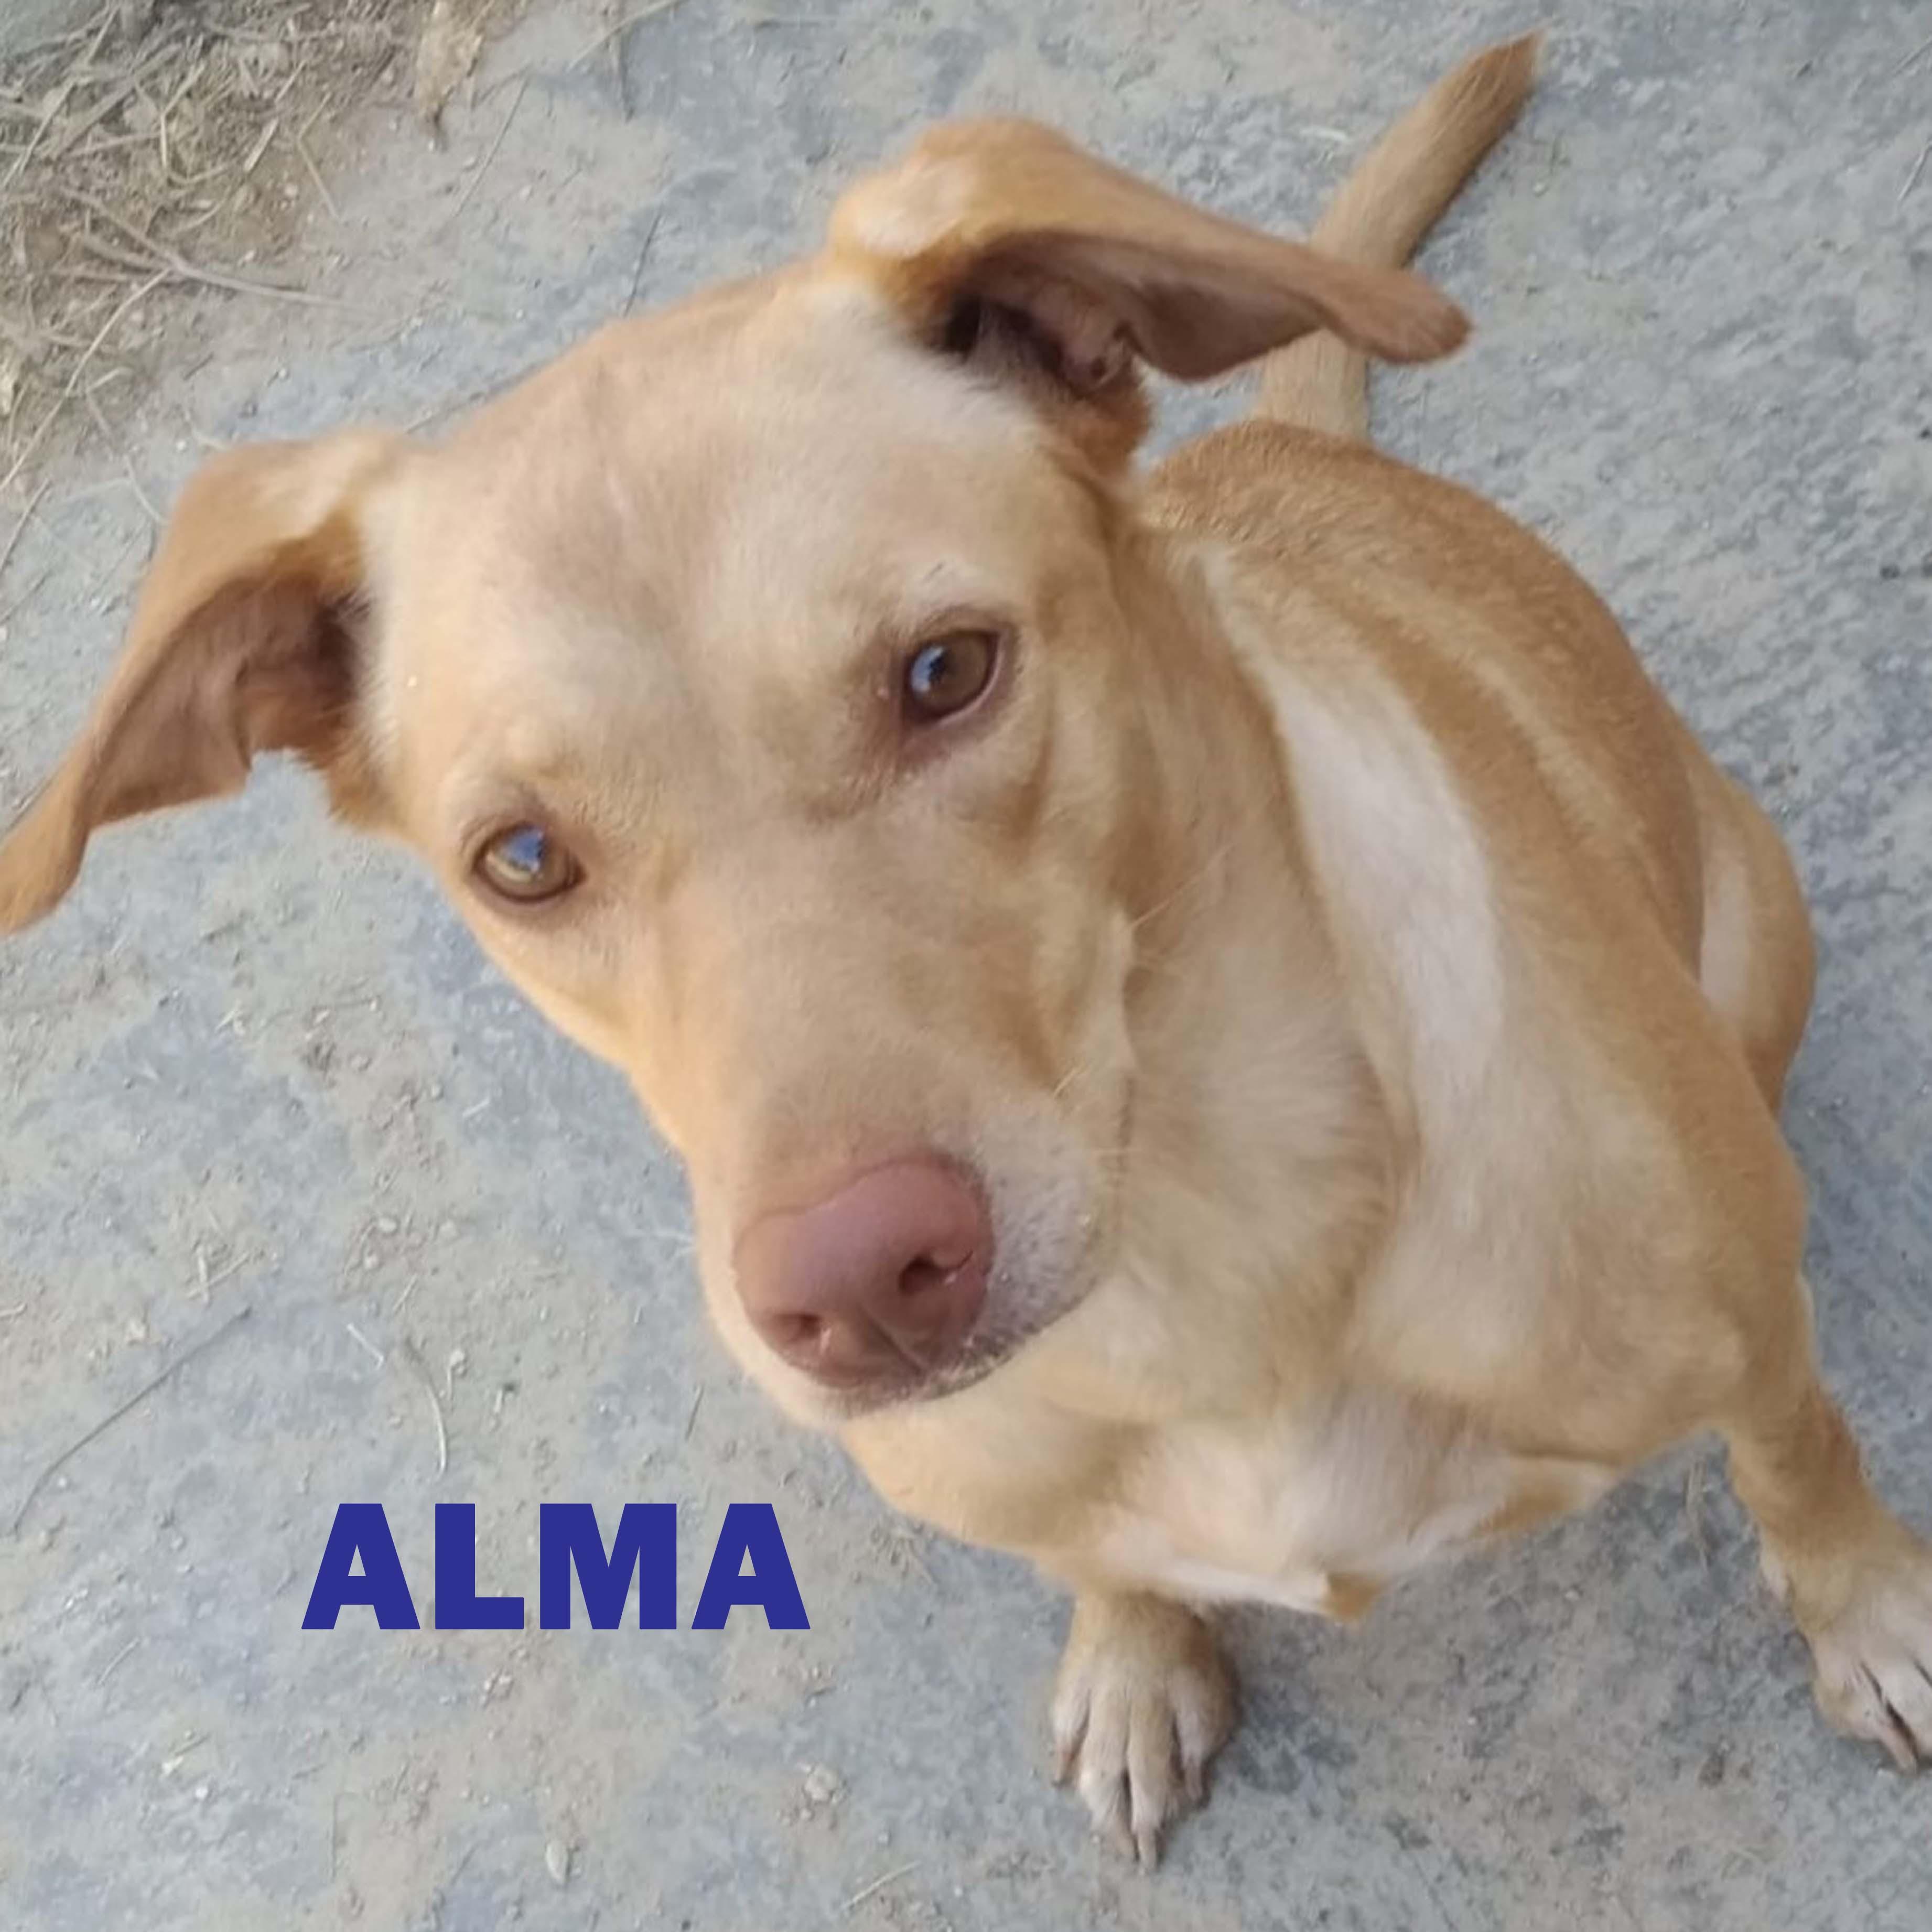 ALMA-INDIA 02 mosaico + nombre